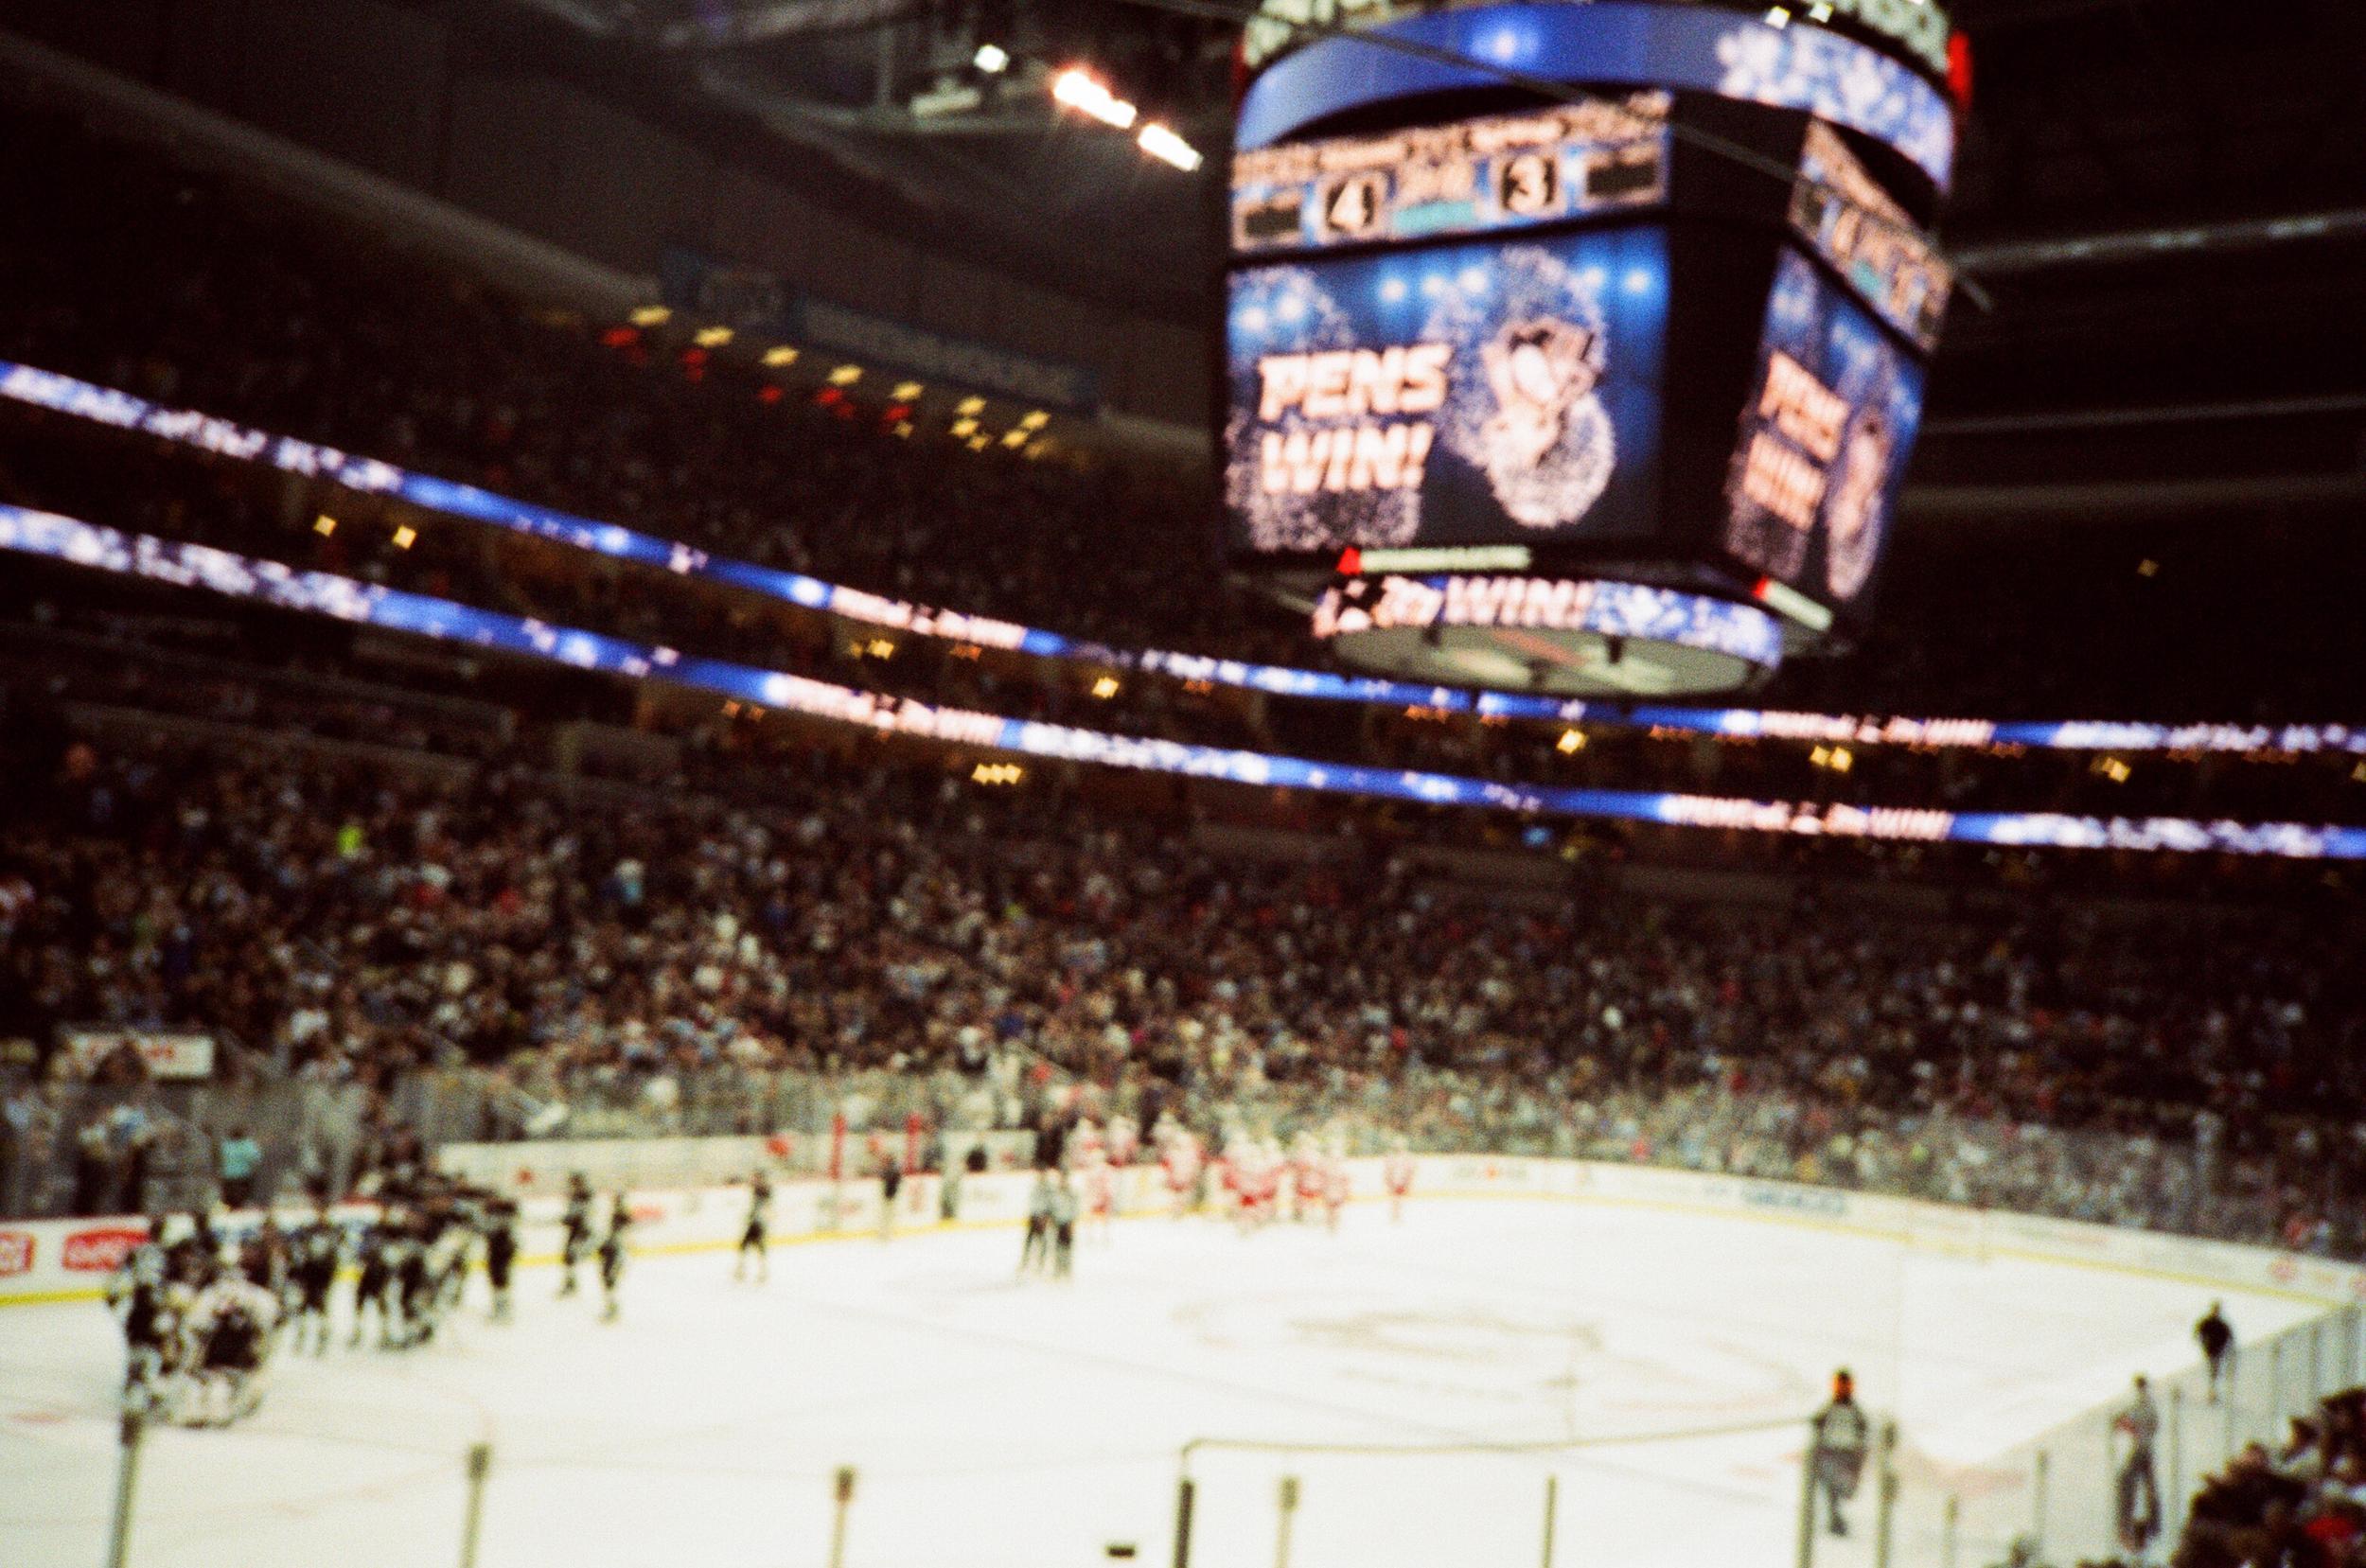 Hockey-Night-In-Pittsburgh-Film-Photography-Karlsson-068.jpg